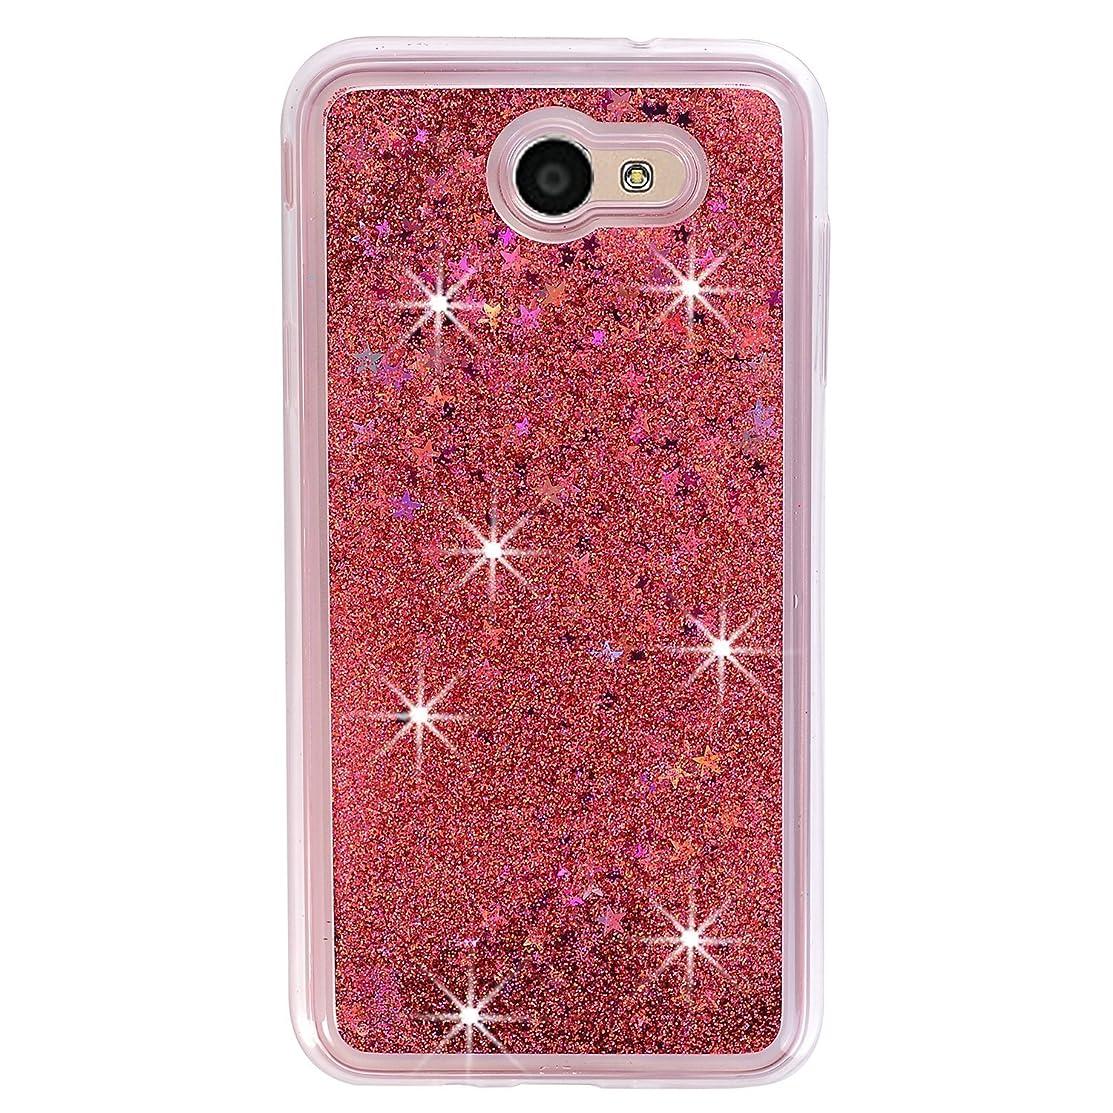 Galaxy J3 2017 Case, J3 2017 Quicksand Star Liquid Case, SUPZY Twinkle Little Stars Moving sand Liquid Shiny Bling Glitter Sparkle Soft TPU Case for Samsung Galaxy J3 2017/J3 Emerge (Rose Gold)